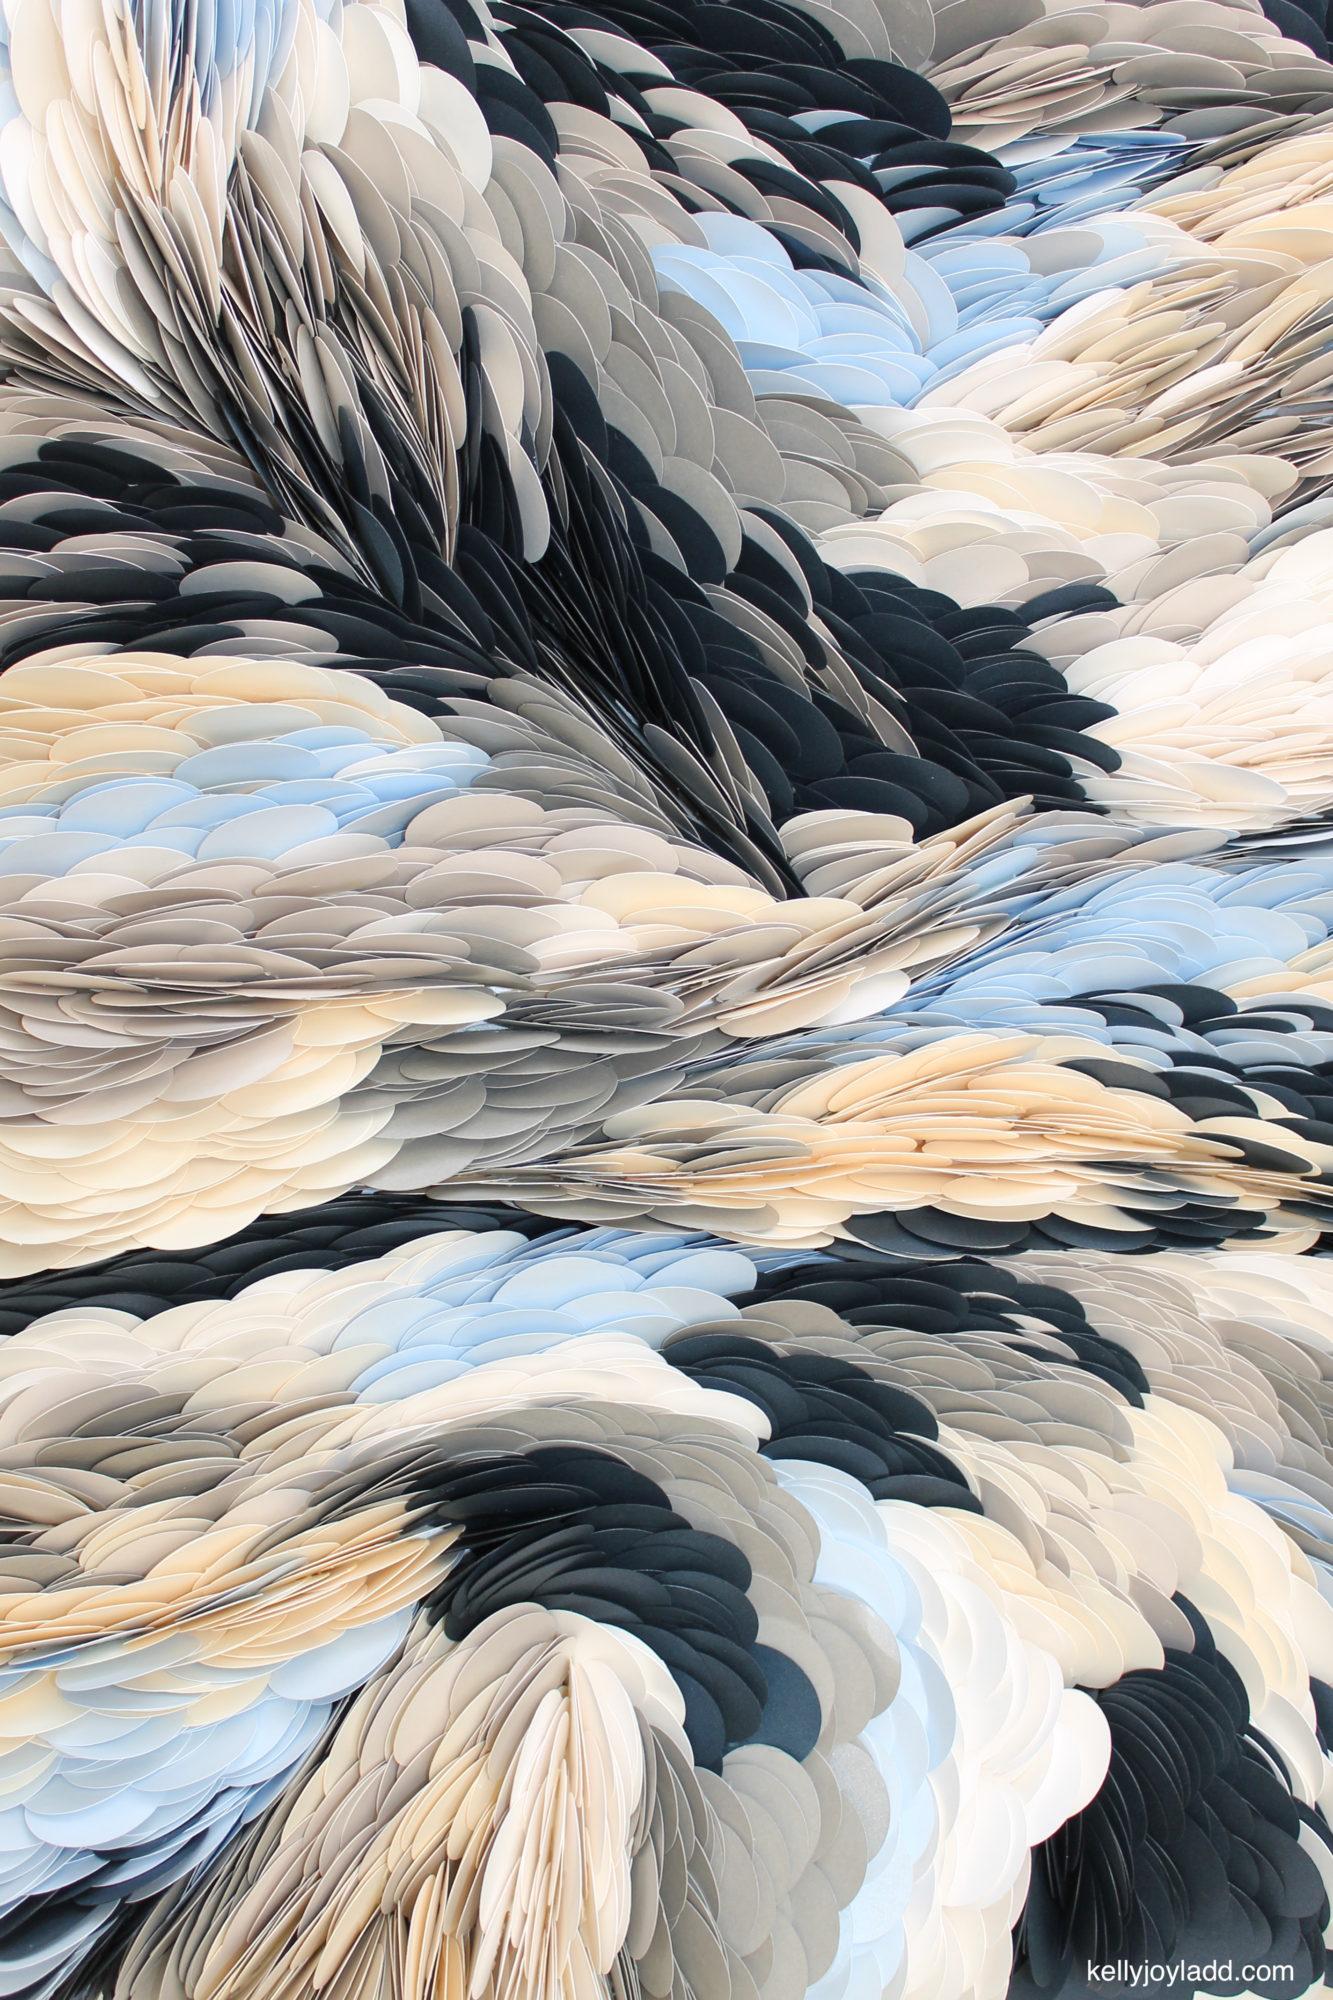 gravitational waves : kellyjoyladd.com paper artist, orlando artist, contemporary artist